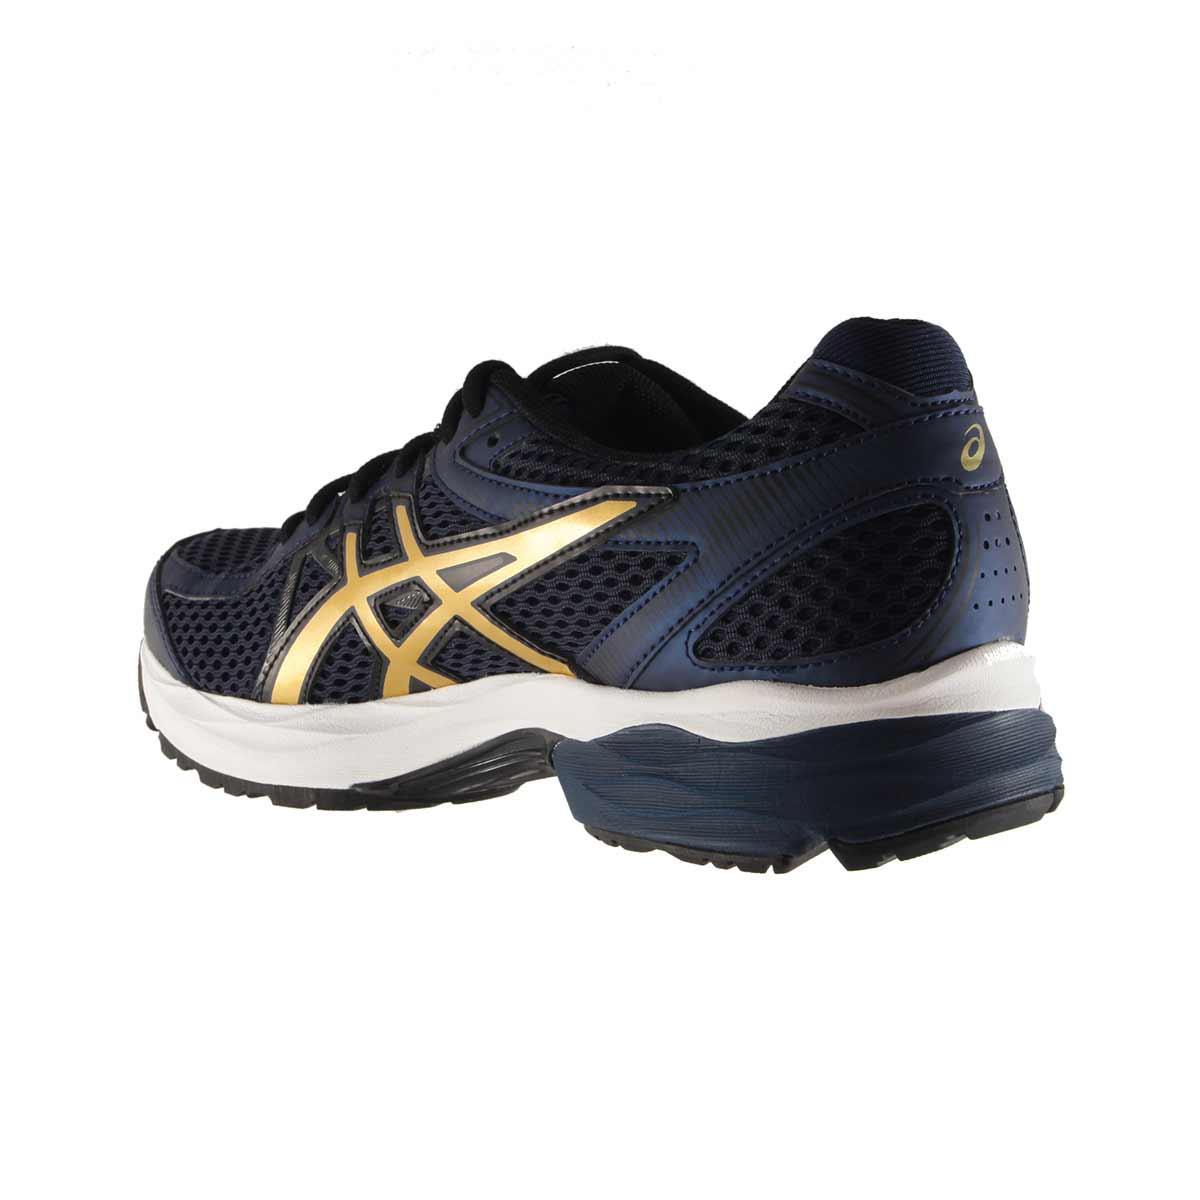 Tênis Asics Gel Flux 3 Masculino Corrida Caminhada T614  - Ian Calçados